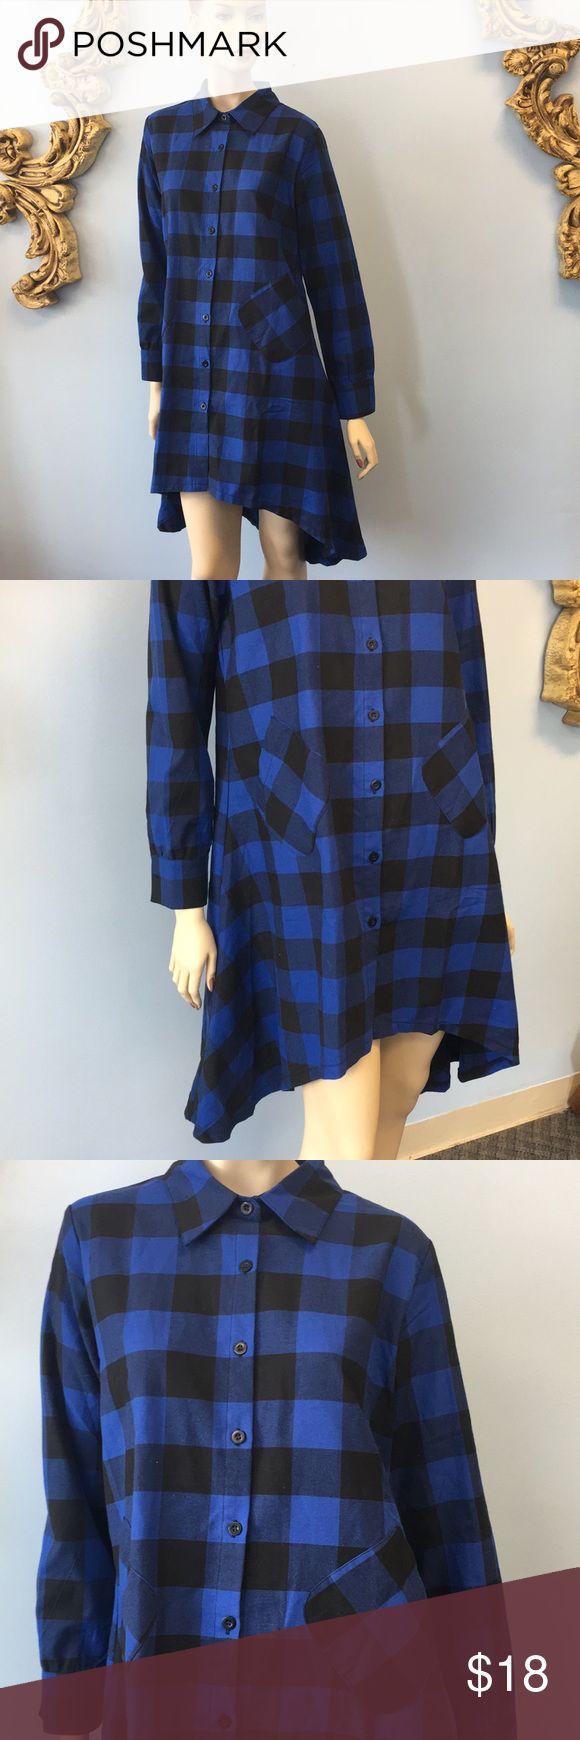 NWT Flannel shirt dress tunic blue black plaid Go Olrain Dresses High Low